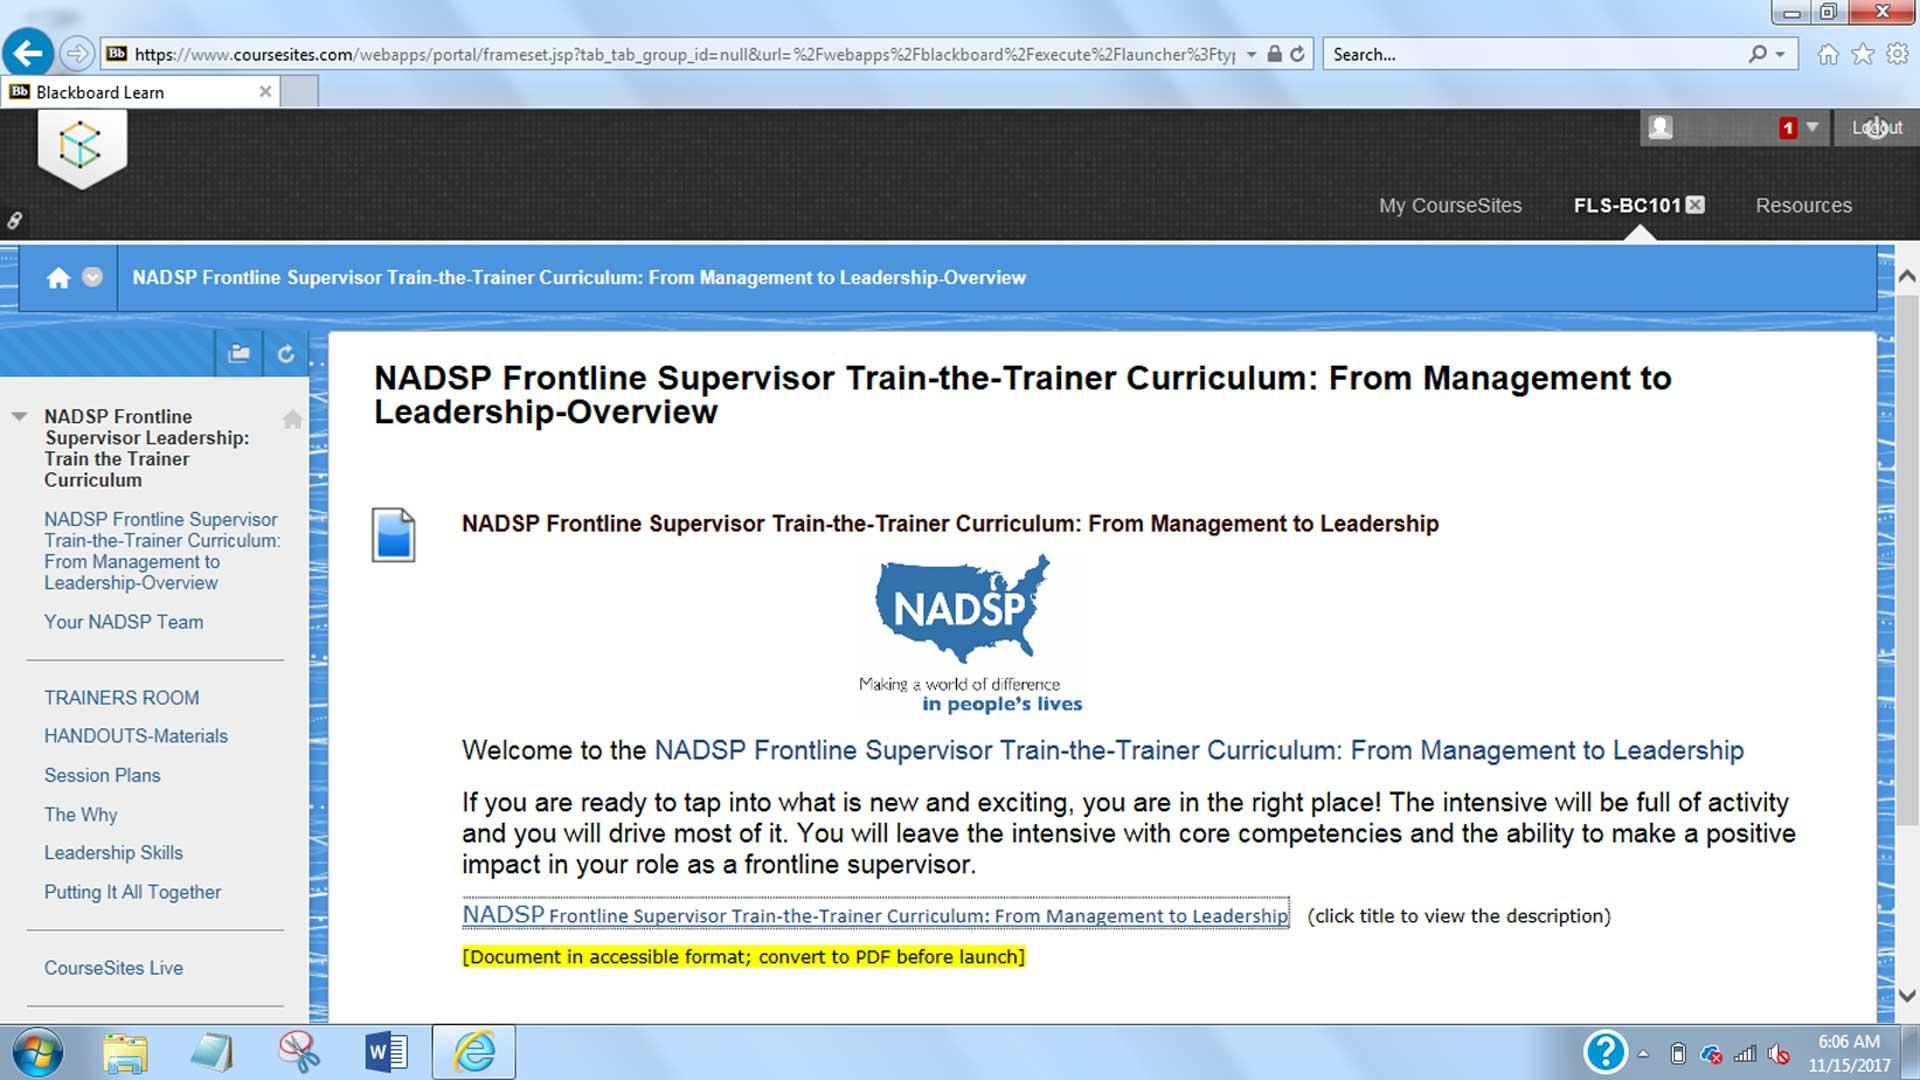 NADSP FLS Curriculum Course